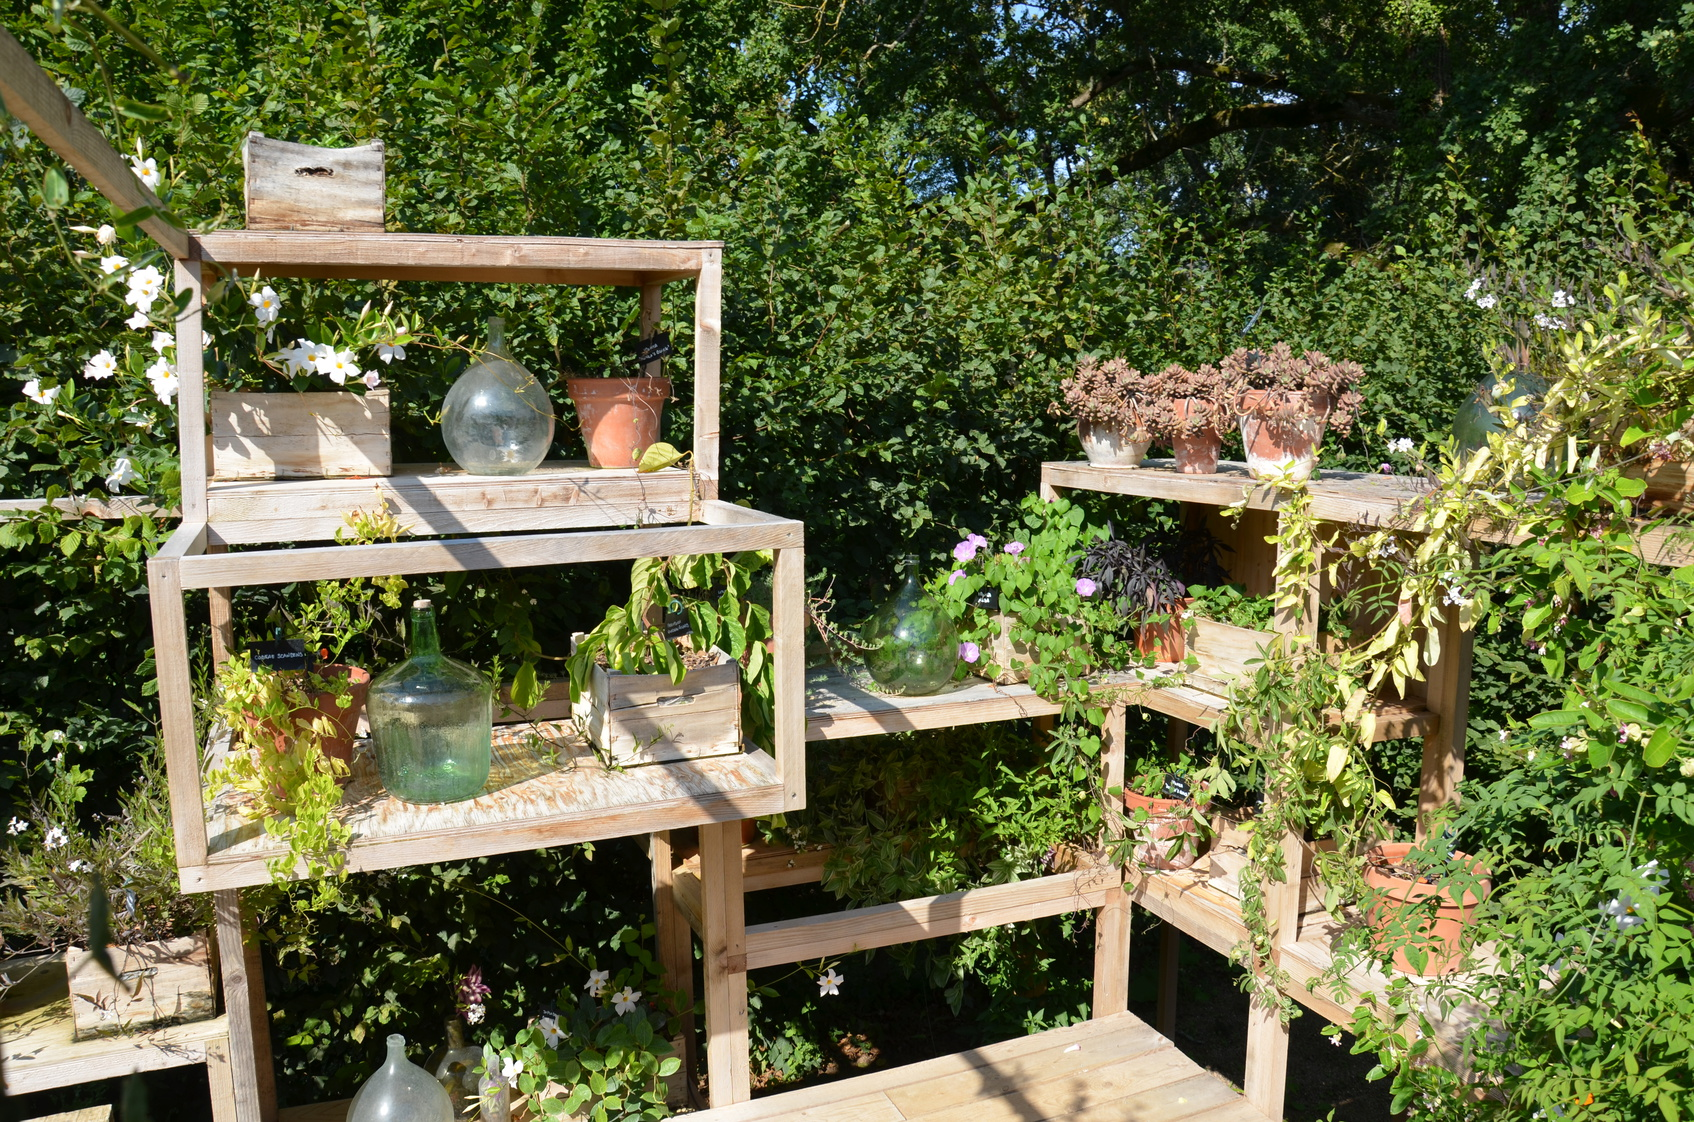 Organiza tu terraza vivienda saludable - Almacenaje exterior ...